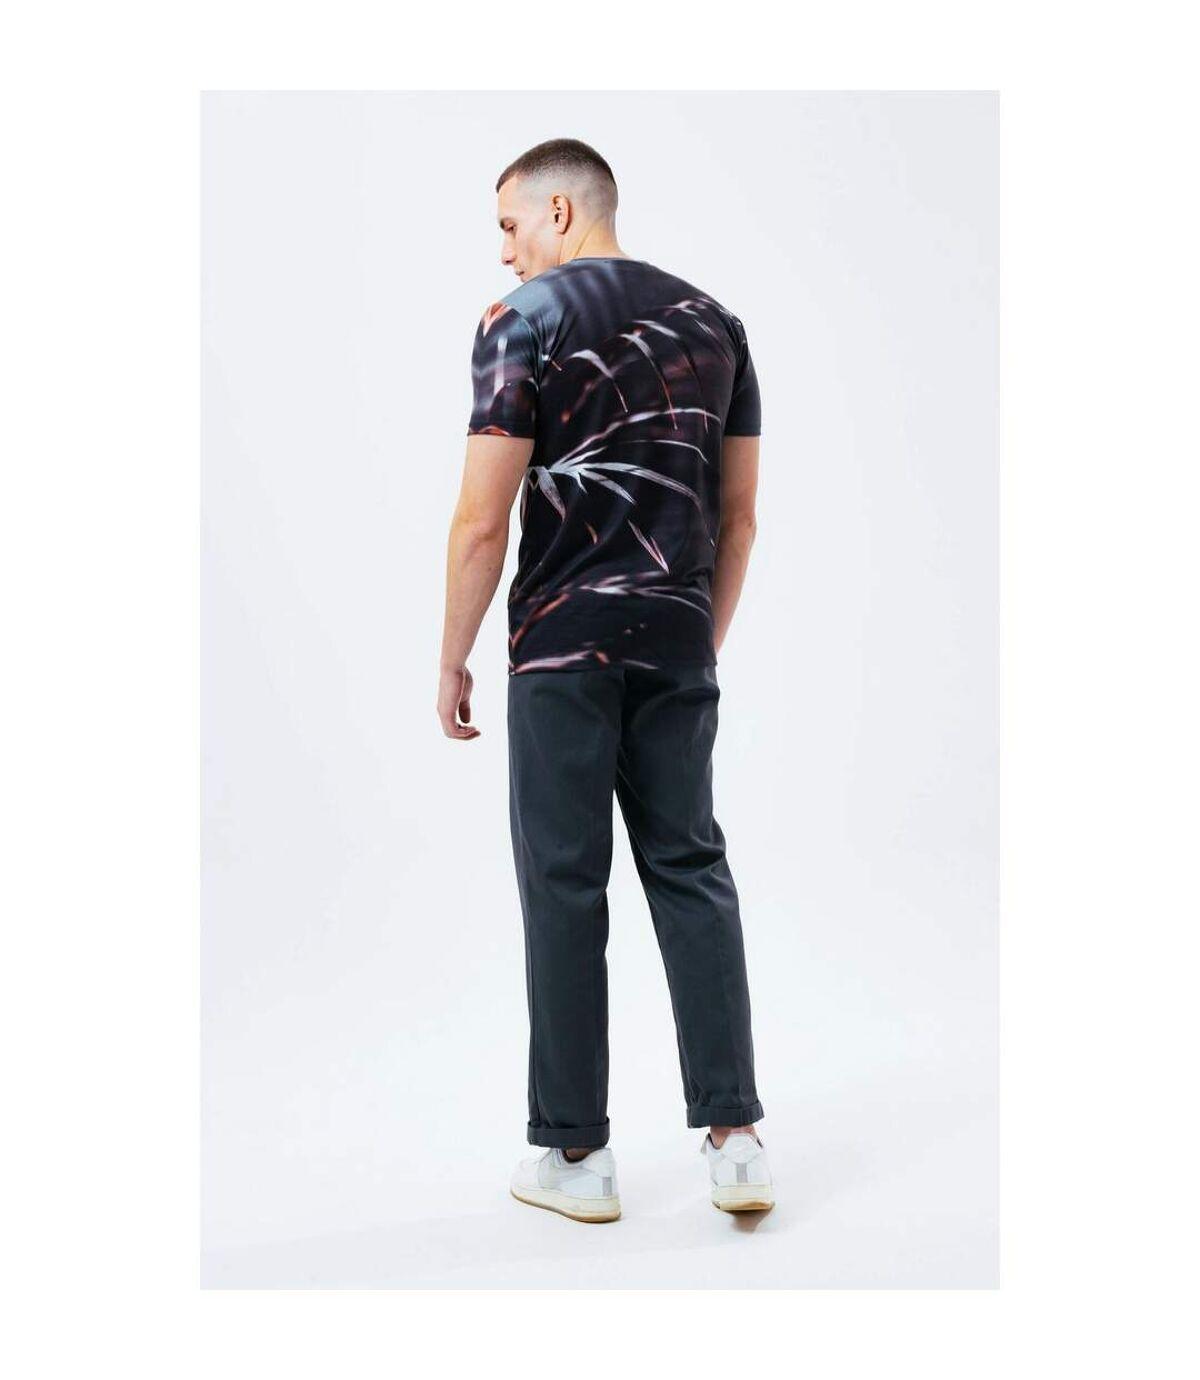 Hype Mens Vintage Palm Print T-Shirt (Multicolore) - UTHY5118